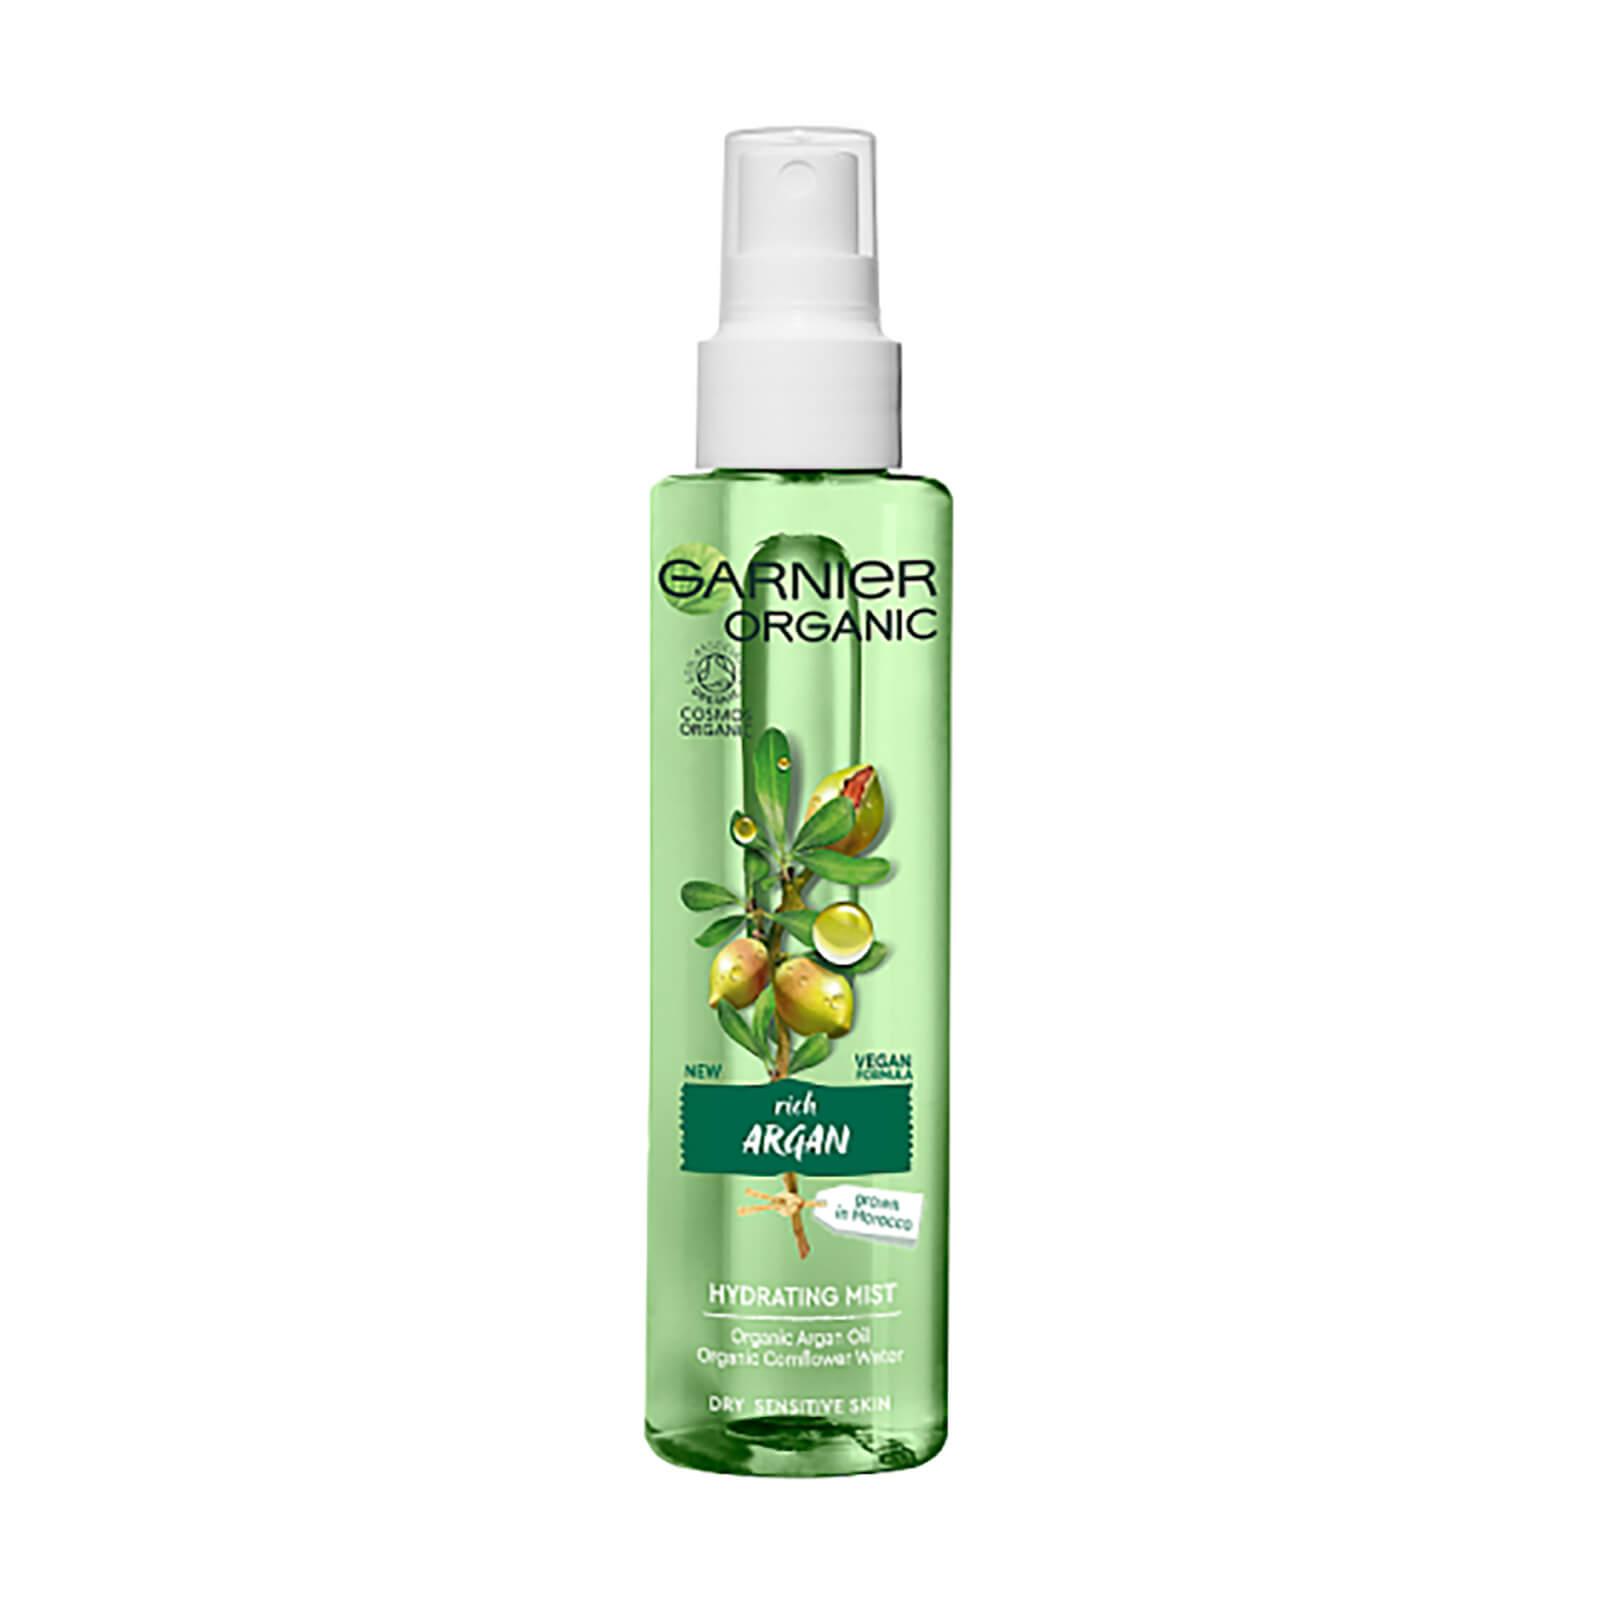 Купить Garnier Organic Argan Mist 150ml